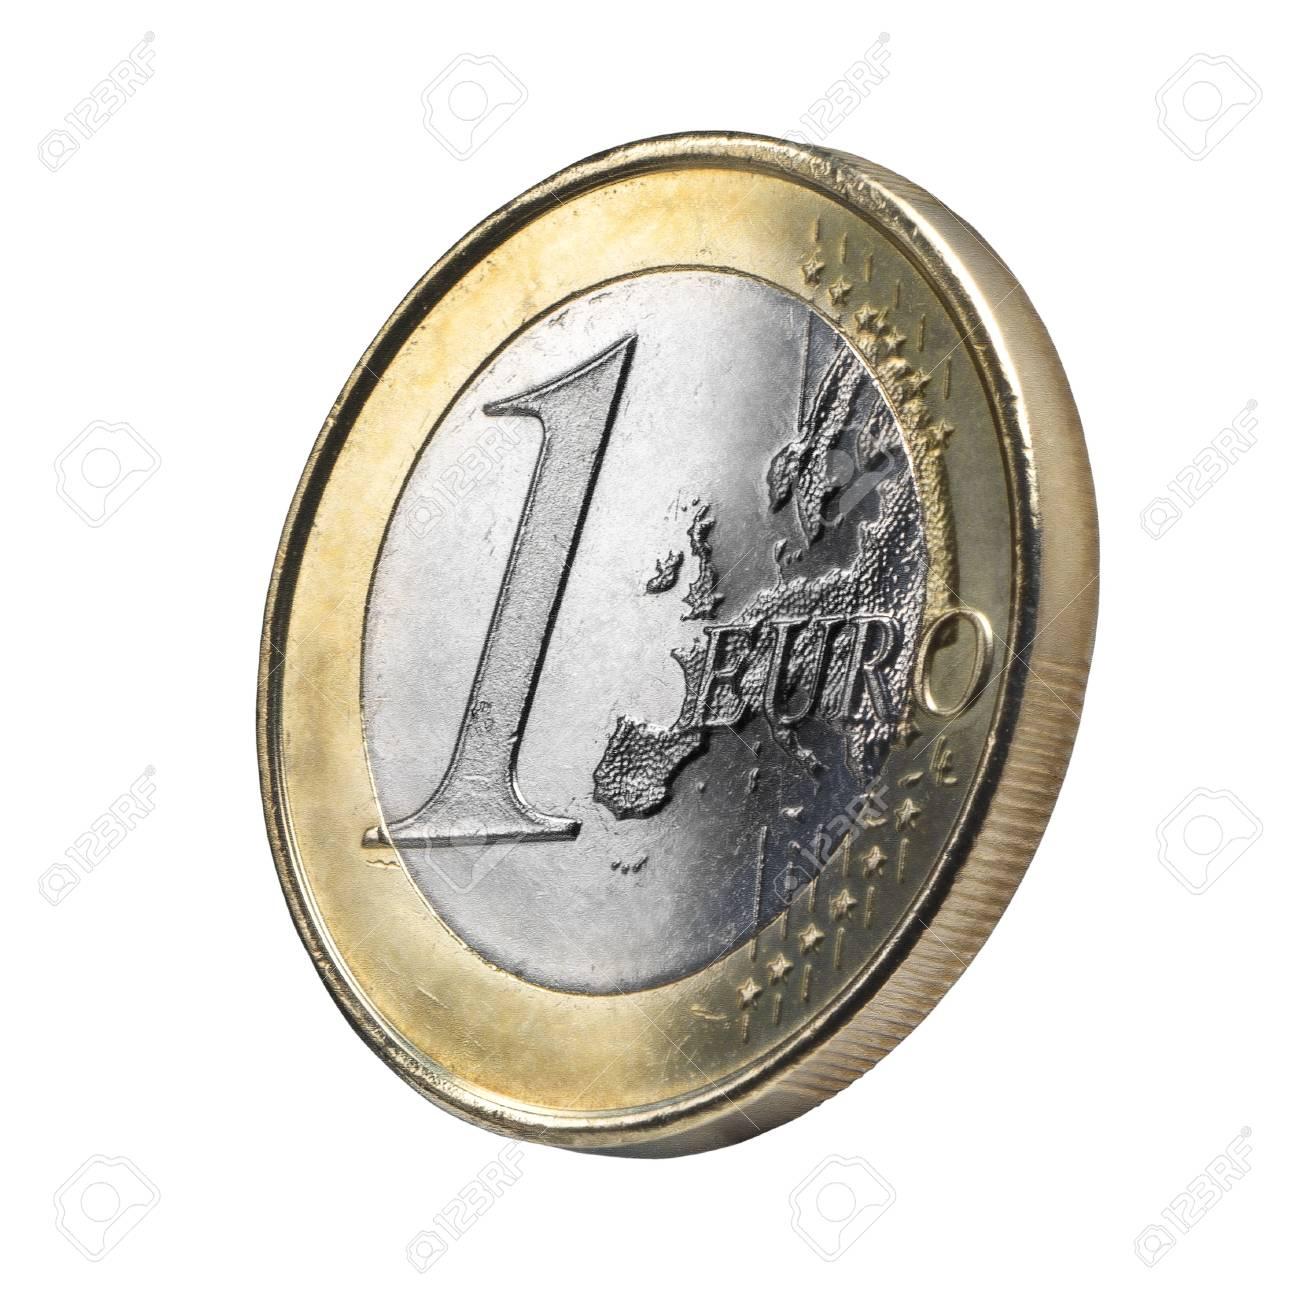 Closeup Euro Münze Ansicht Clipping Pfad Lizenzfreie Fotos Bilder